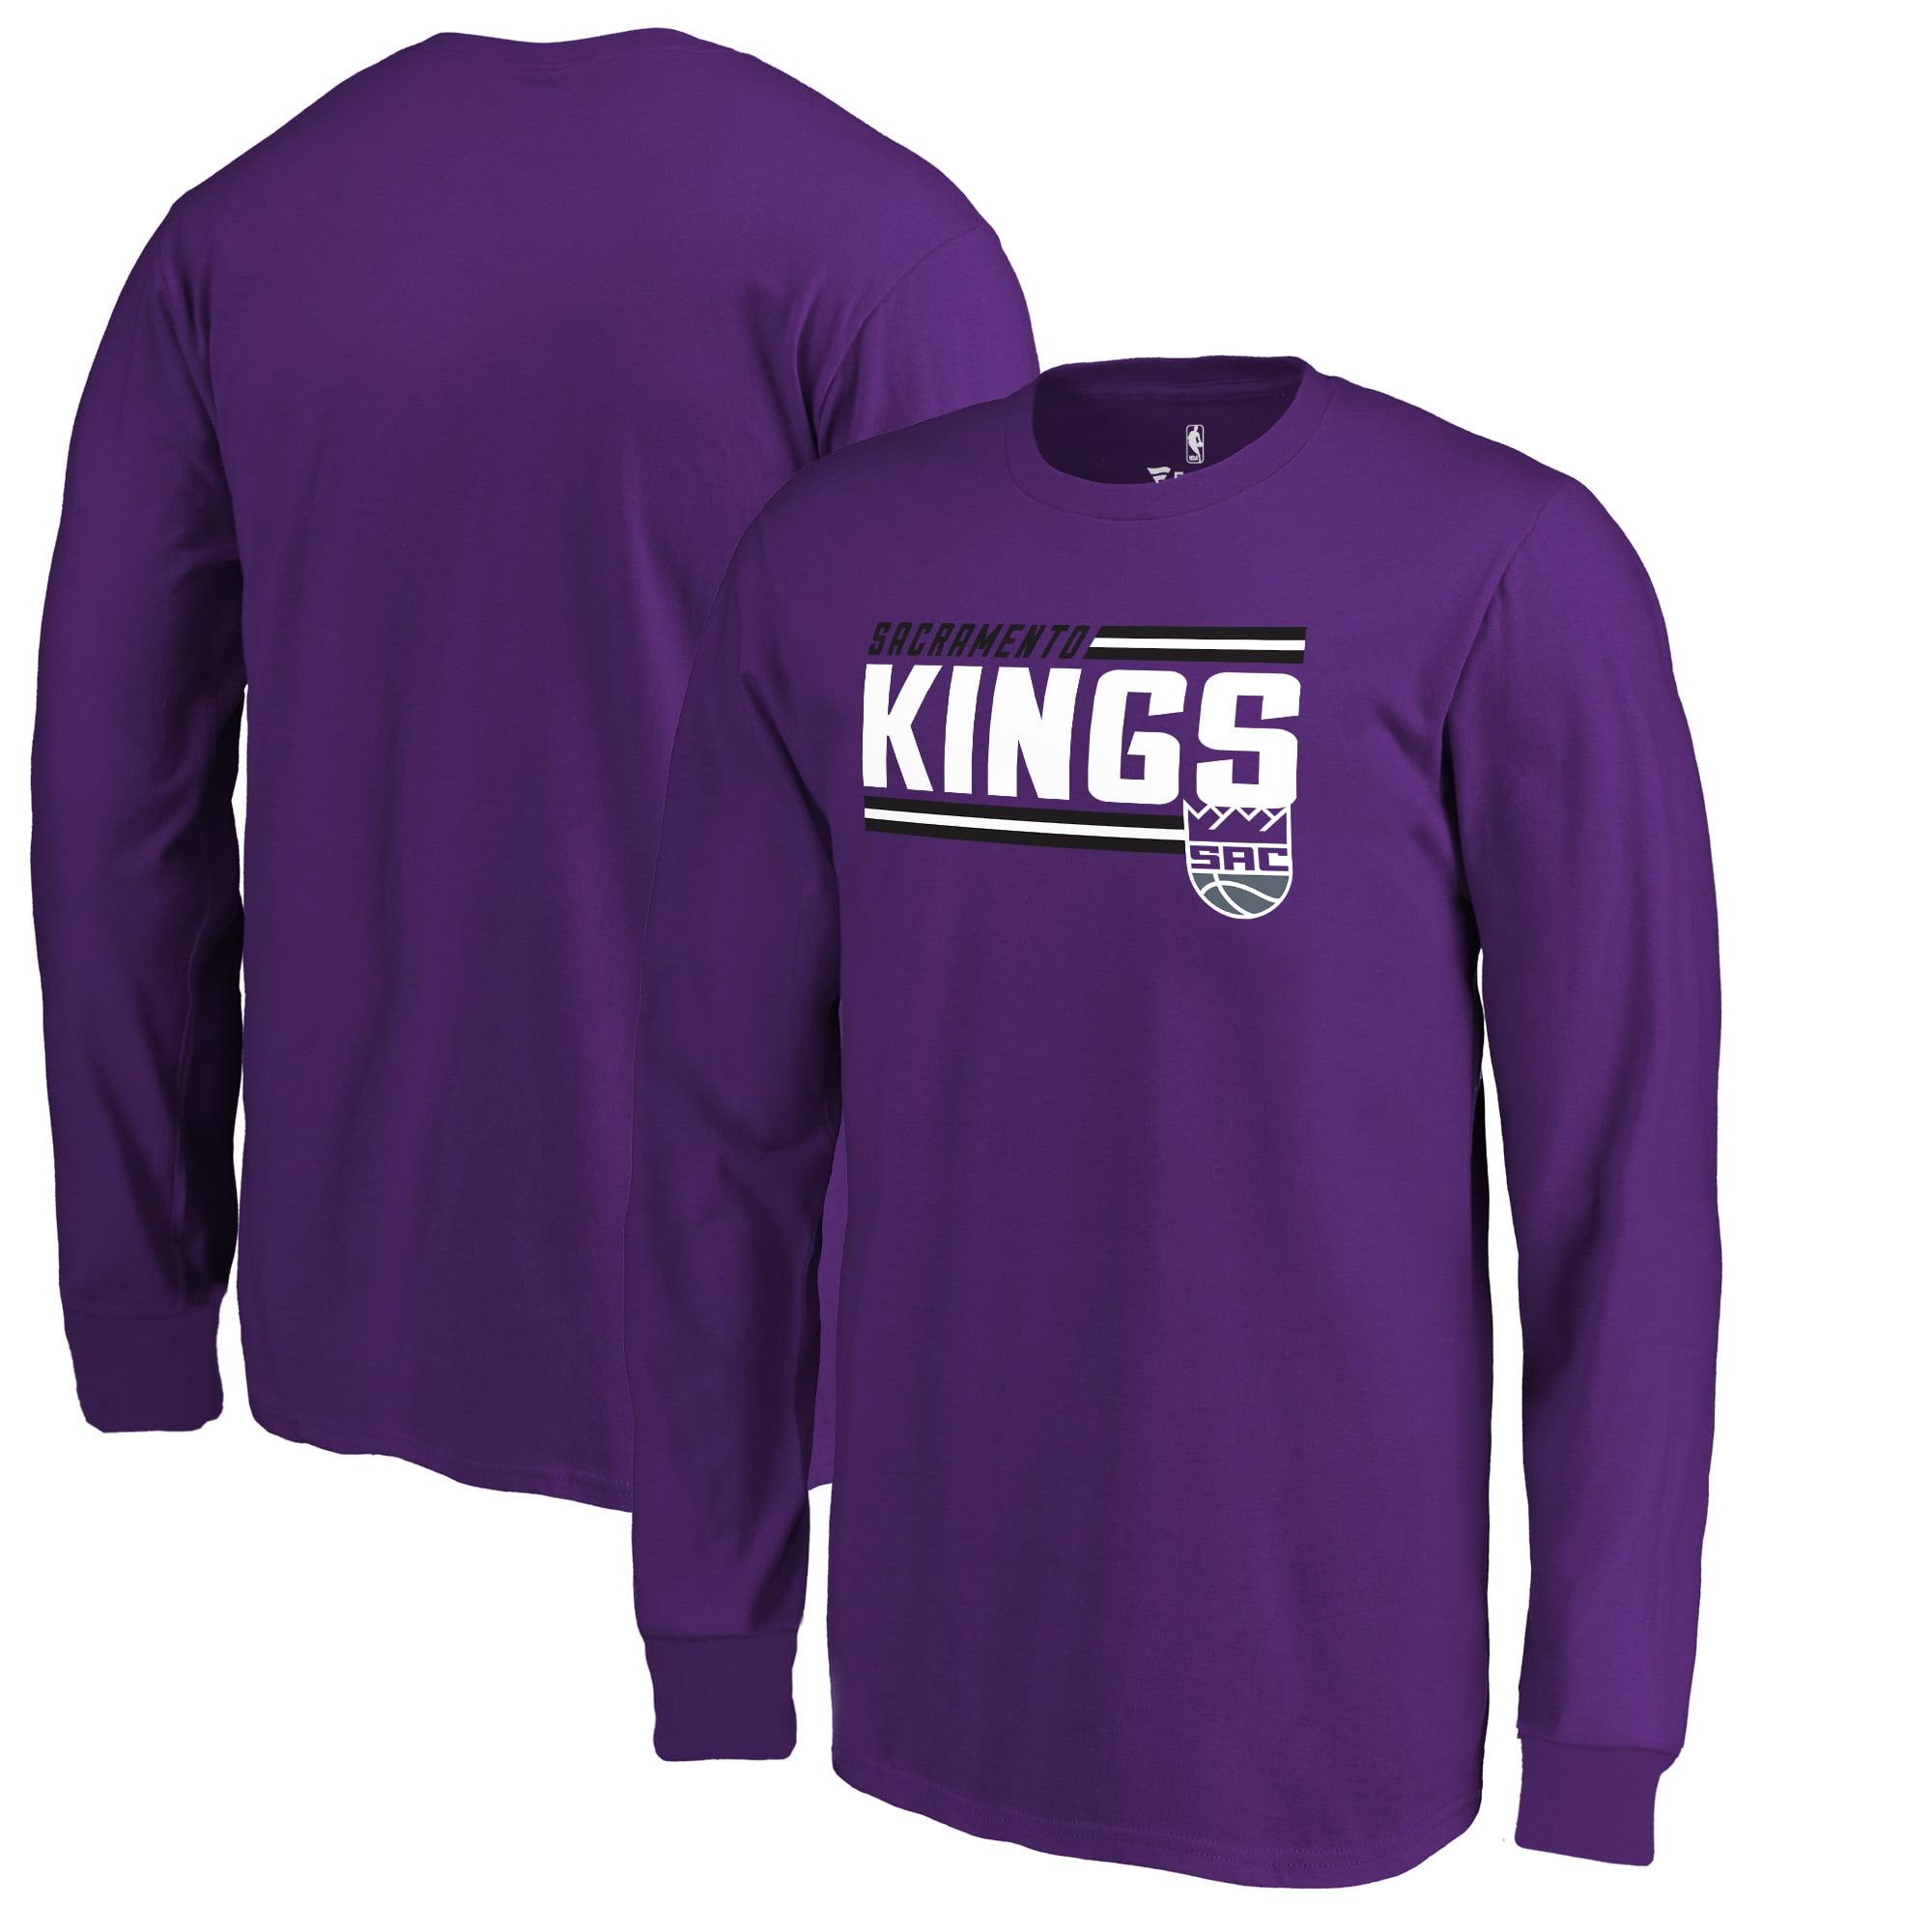 Sacramento Kings Fanatics Branded Youth Onside Stripe Long Sleeve T-Shirt - Purple